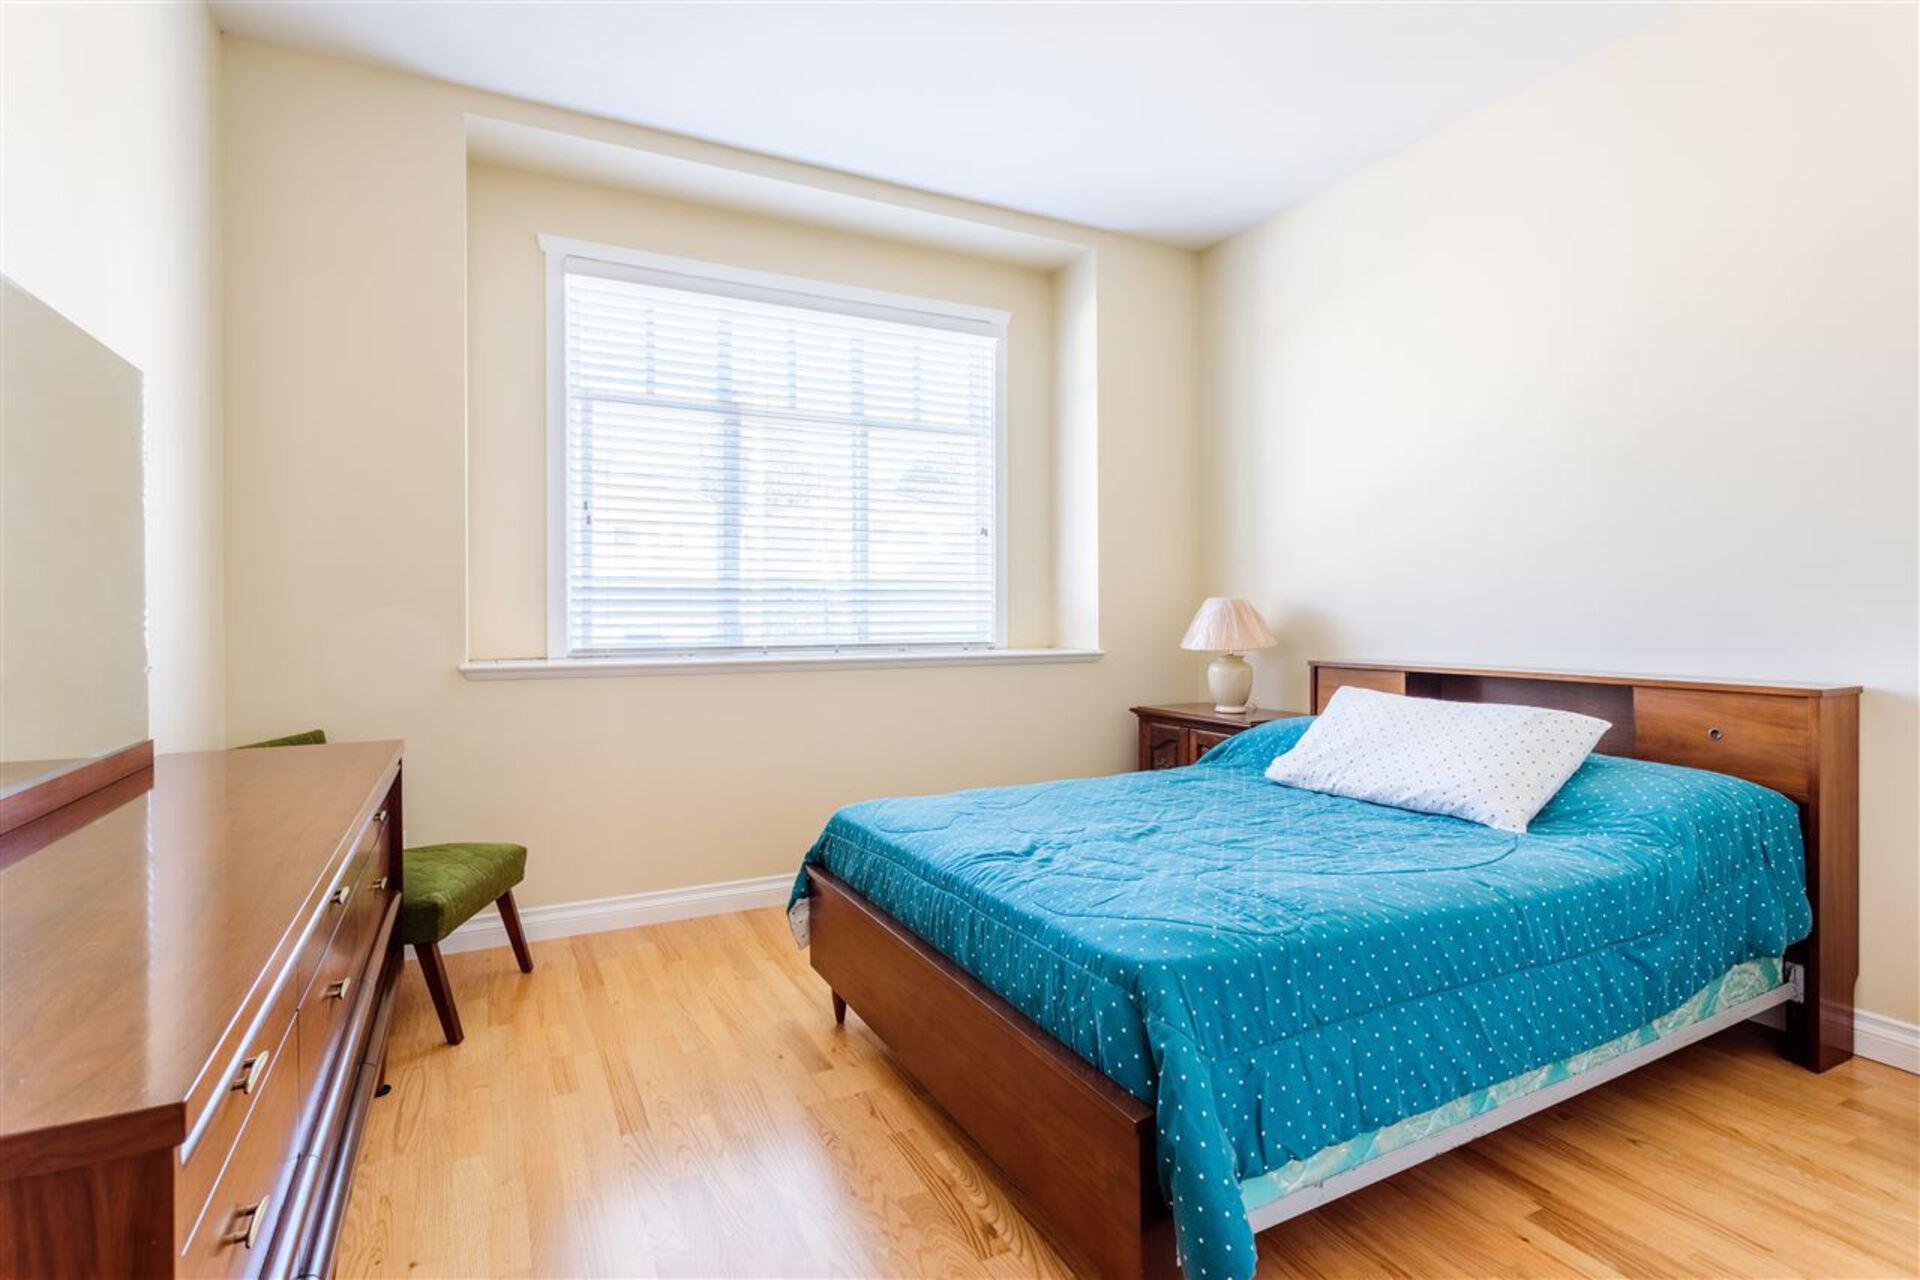 4015-frances-street-willingdon-heights-burnaby-north-11 at 4015 Frances Street, Willingdon Heights, Burnaby North